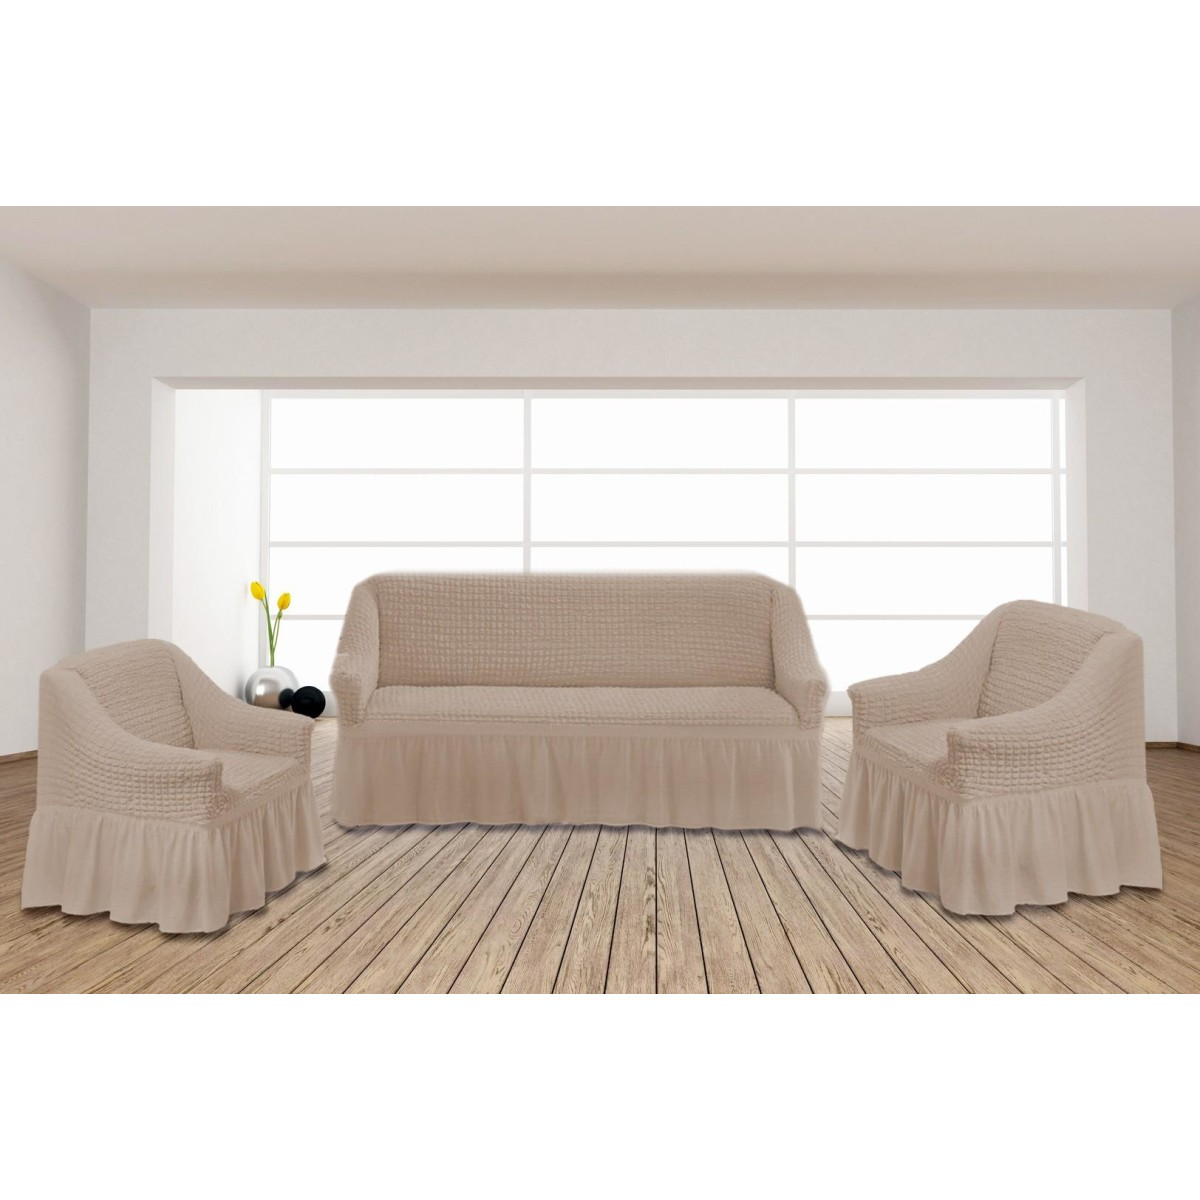 Комплект чехлов для мебели Texrepublic Absolute 8820